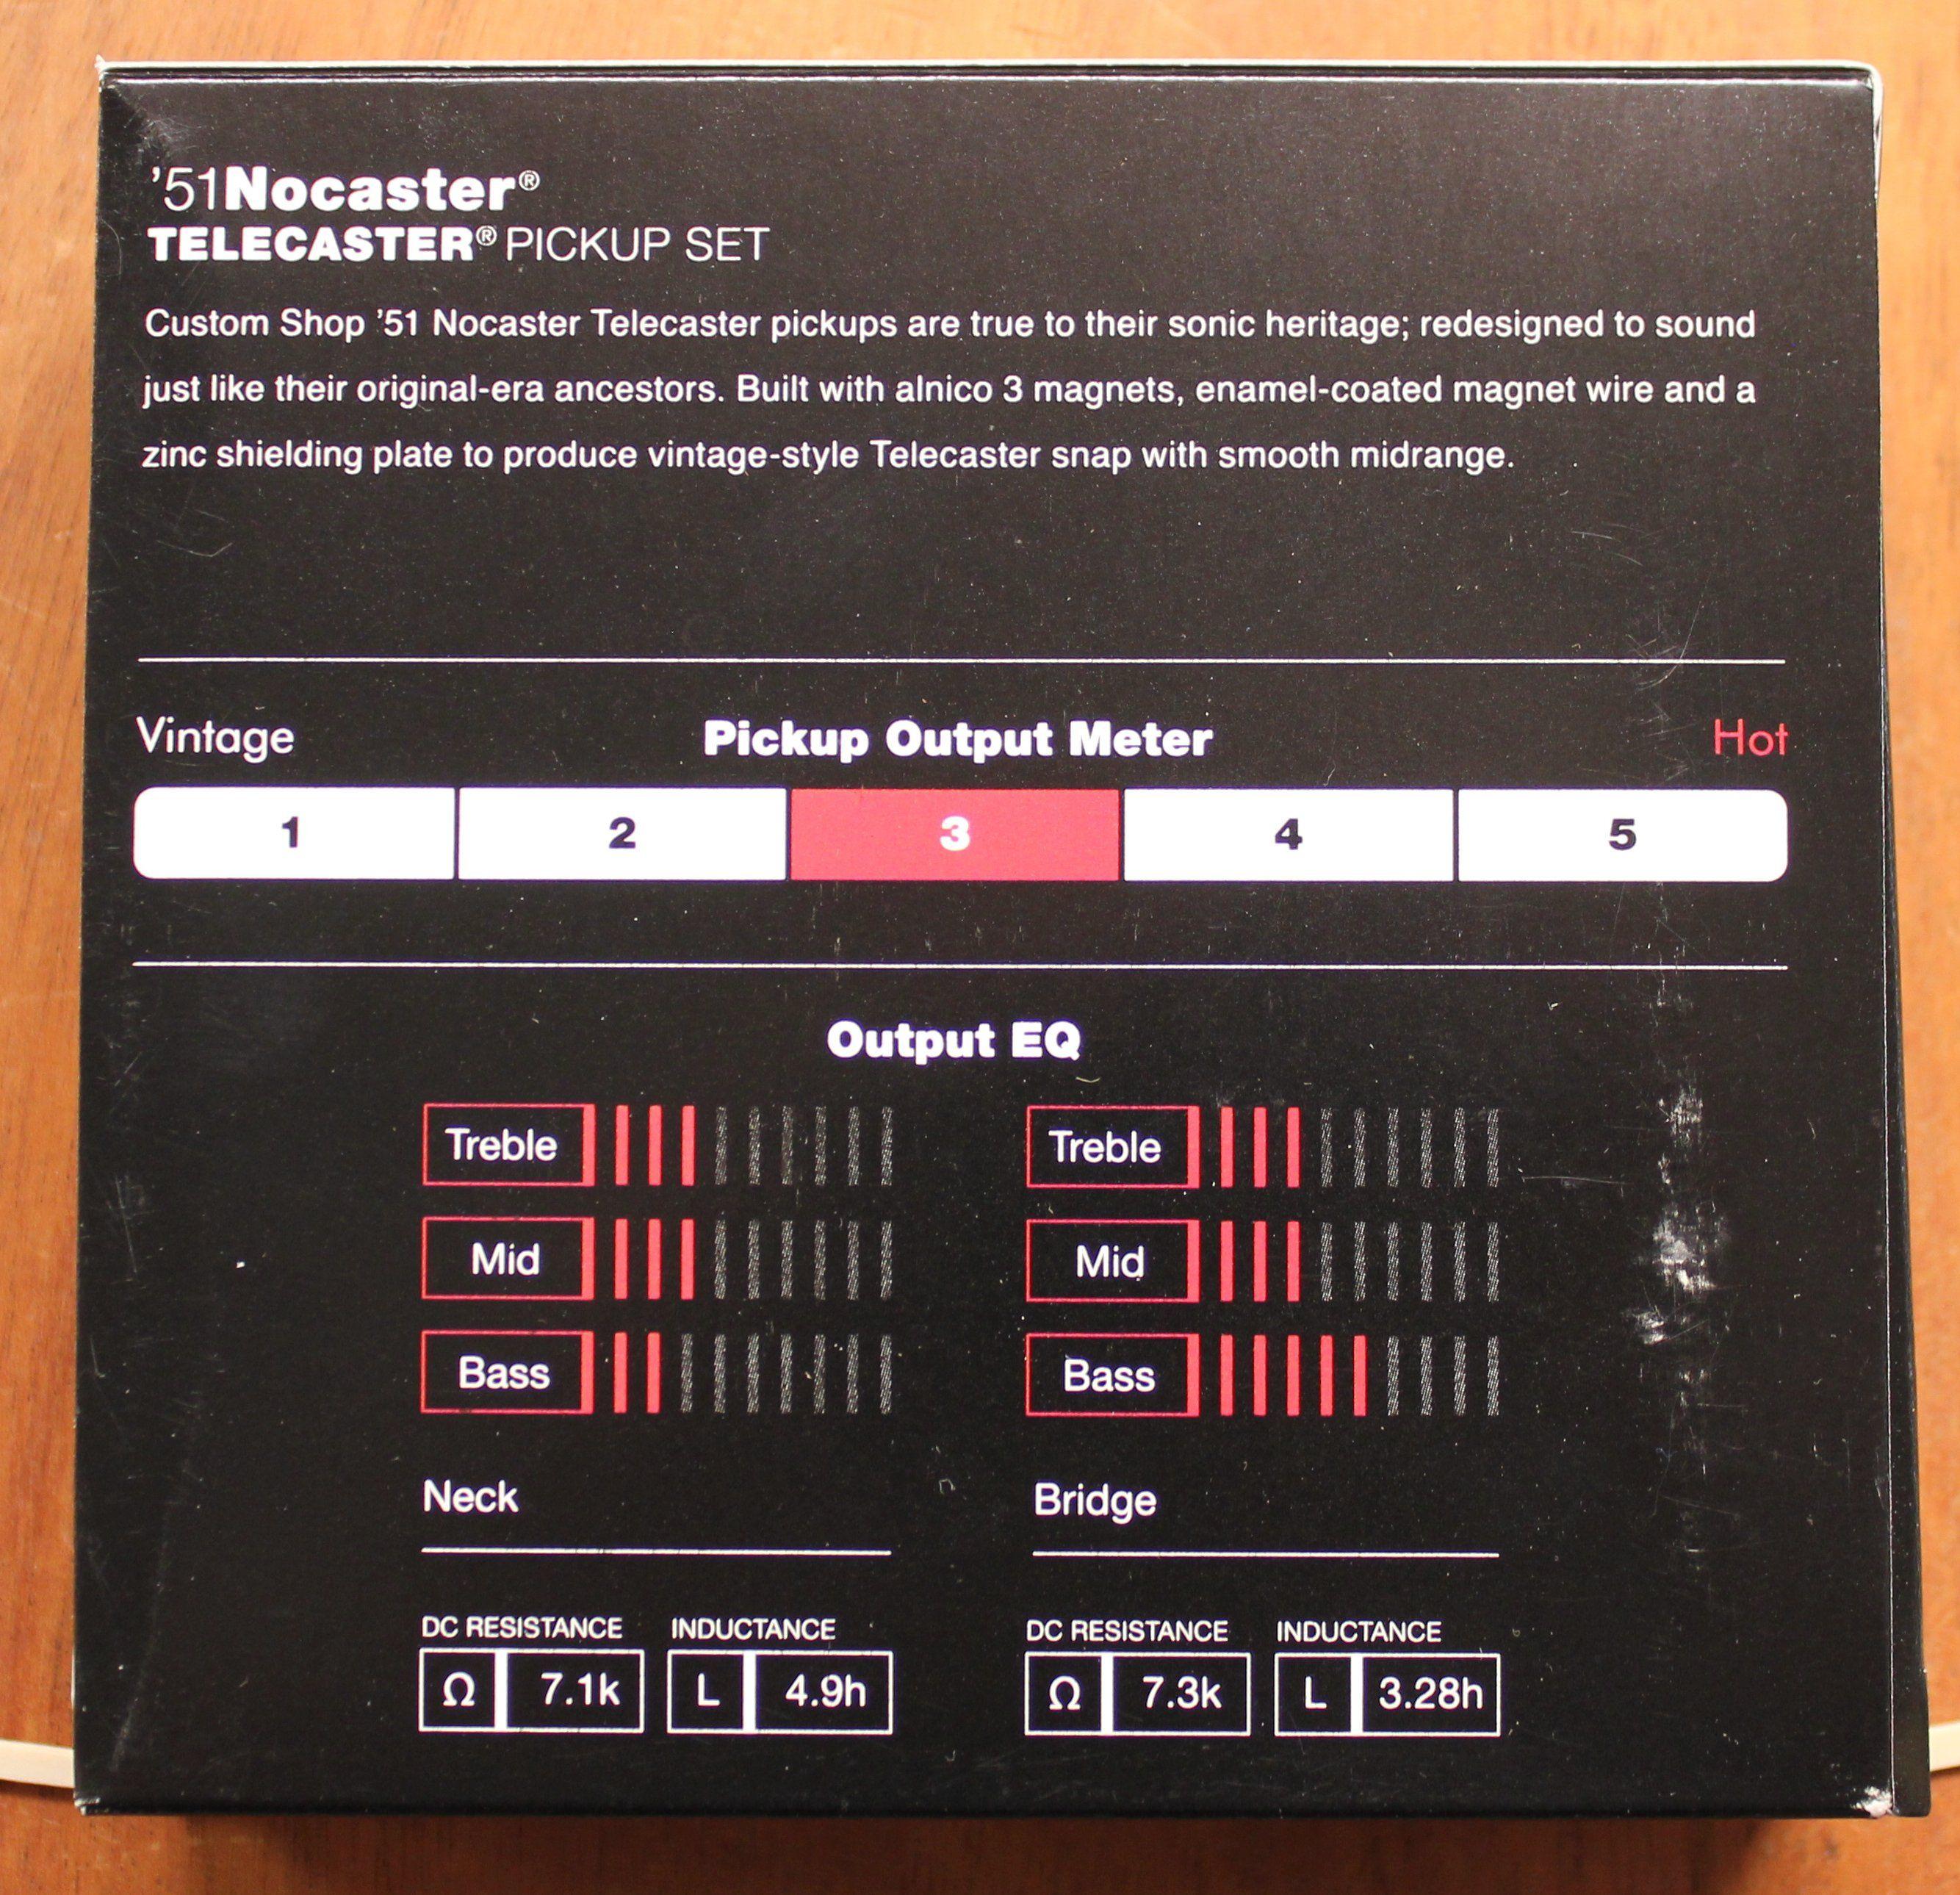 Fender Custom Shop 51 Nocaster Telecaster Pickup Set In 2021 Fender Custom Shop Telecaster Pickups Telecaster